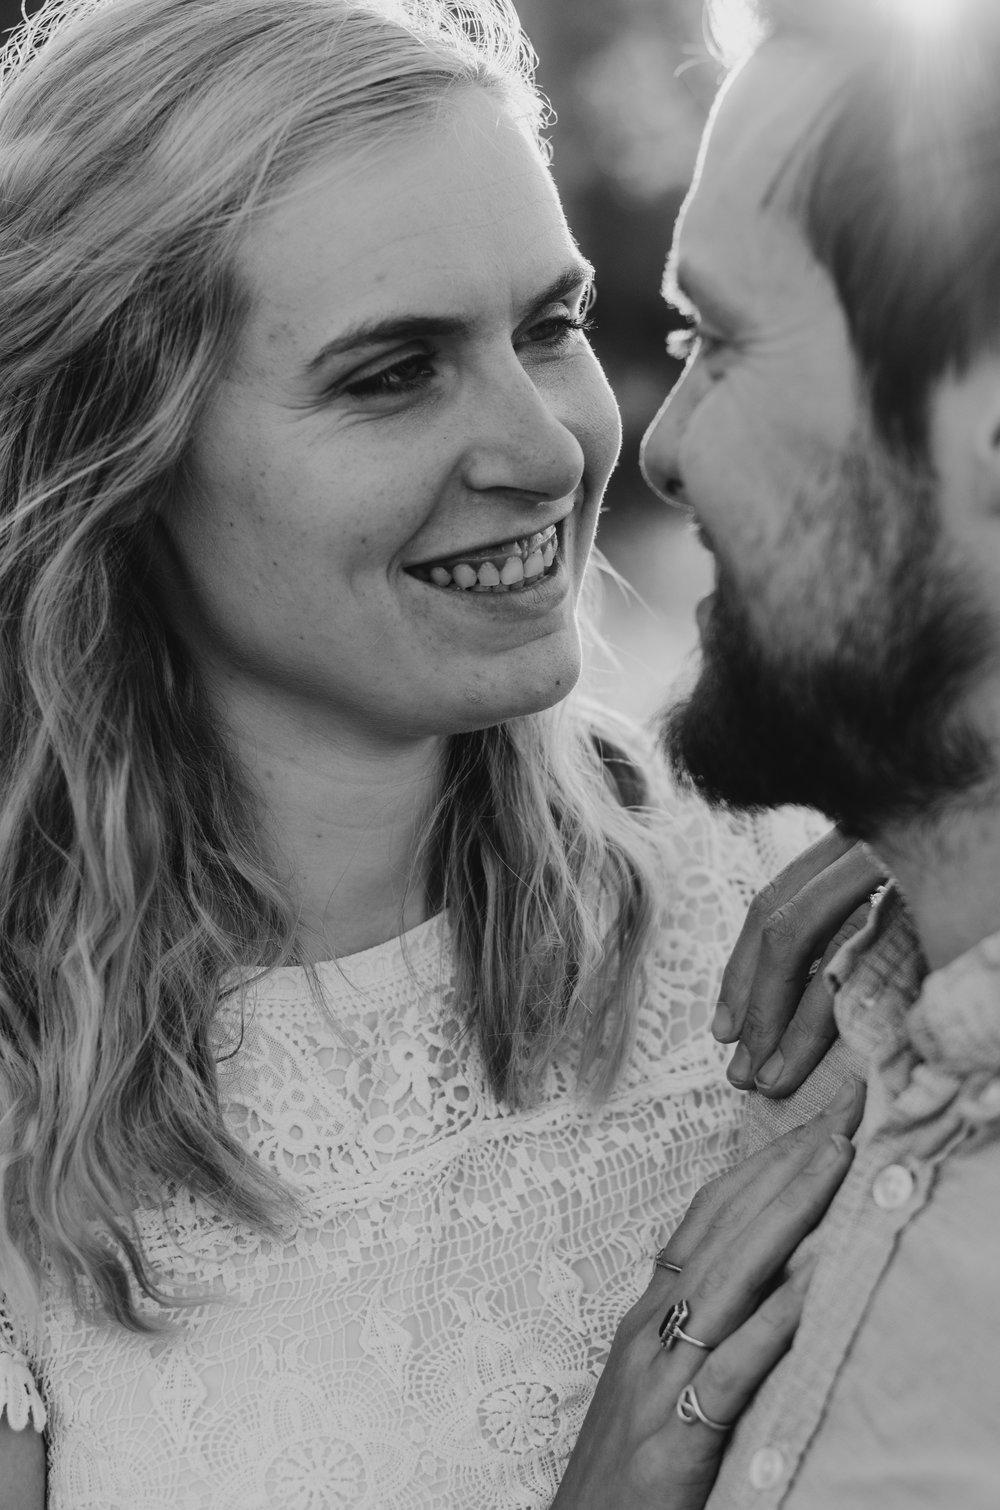 Gina & Chris - Barcombe Mills - Couple Session - Aiste Saulyte Photography-22.jpg